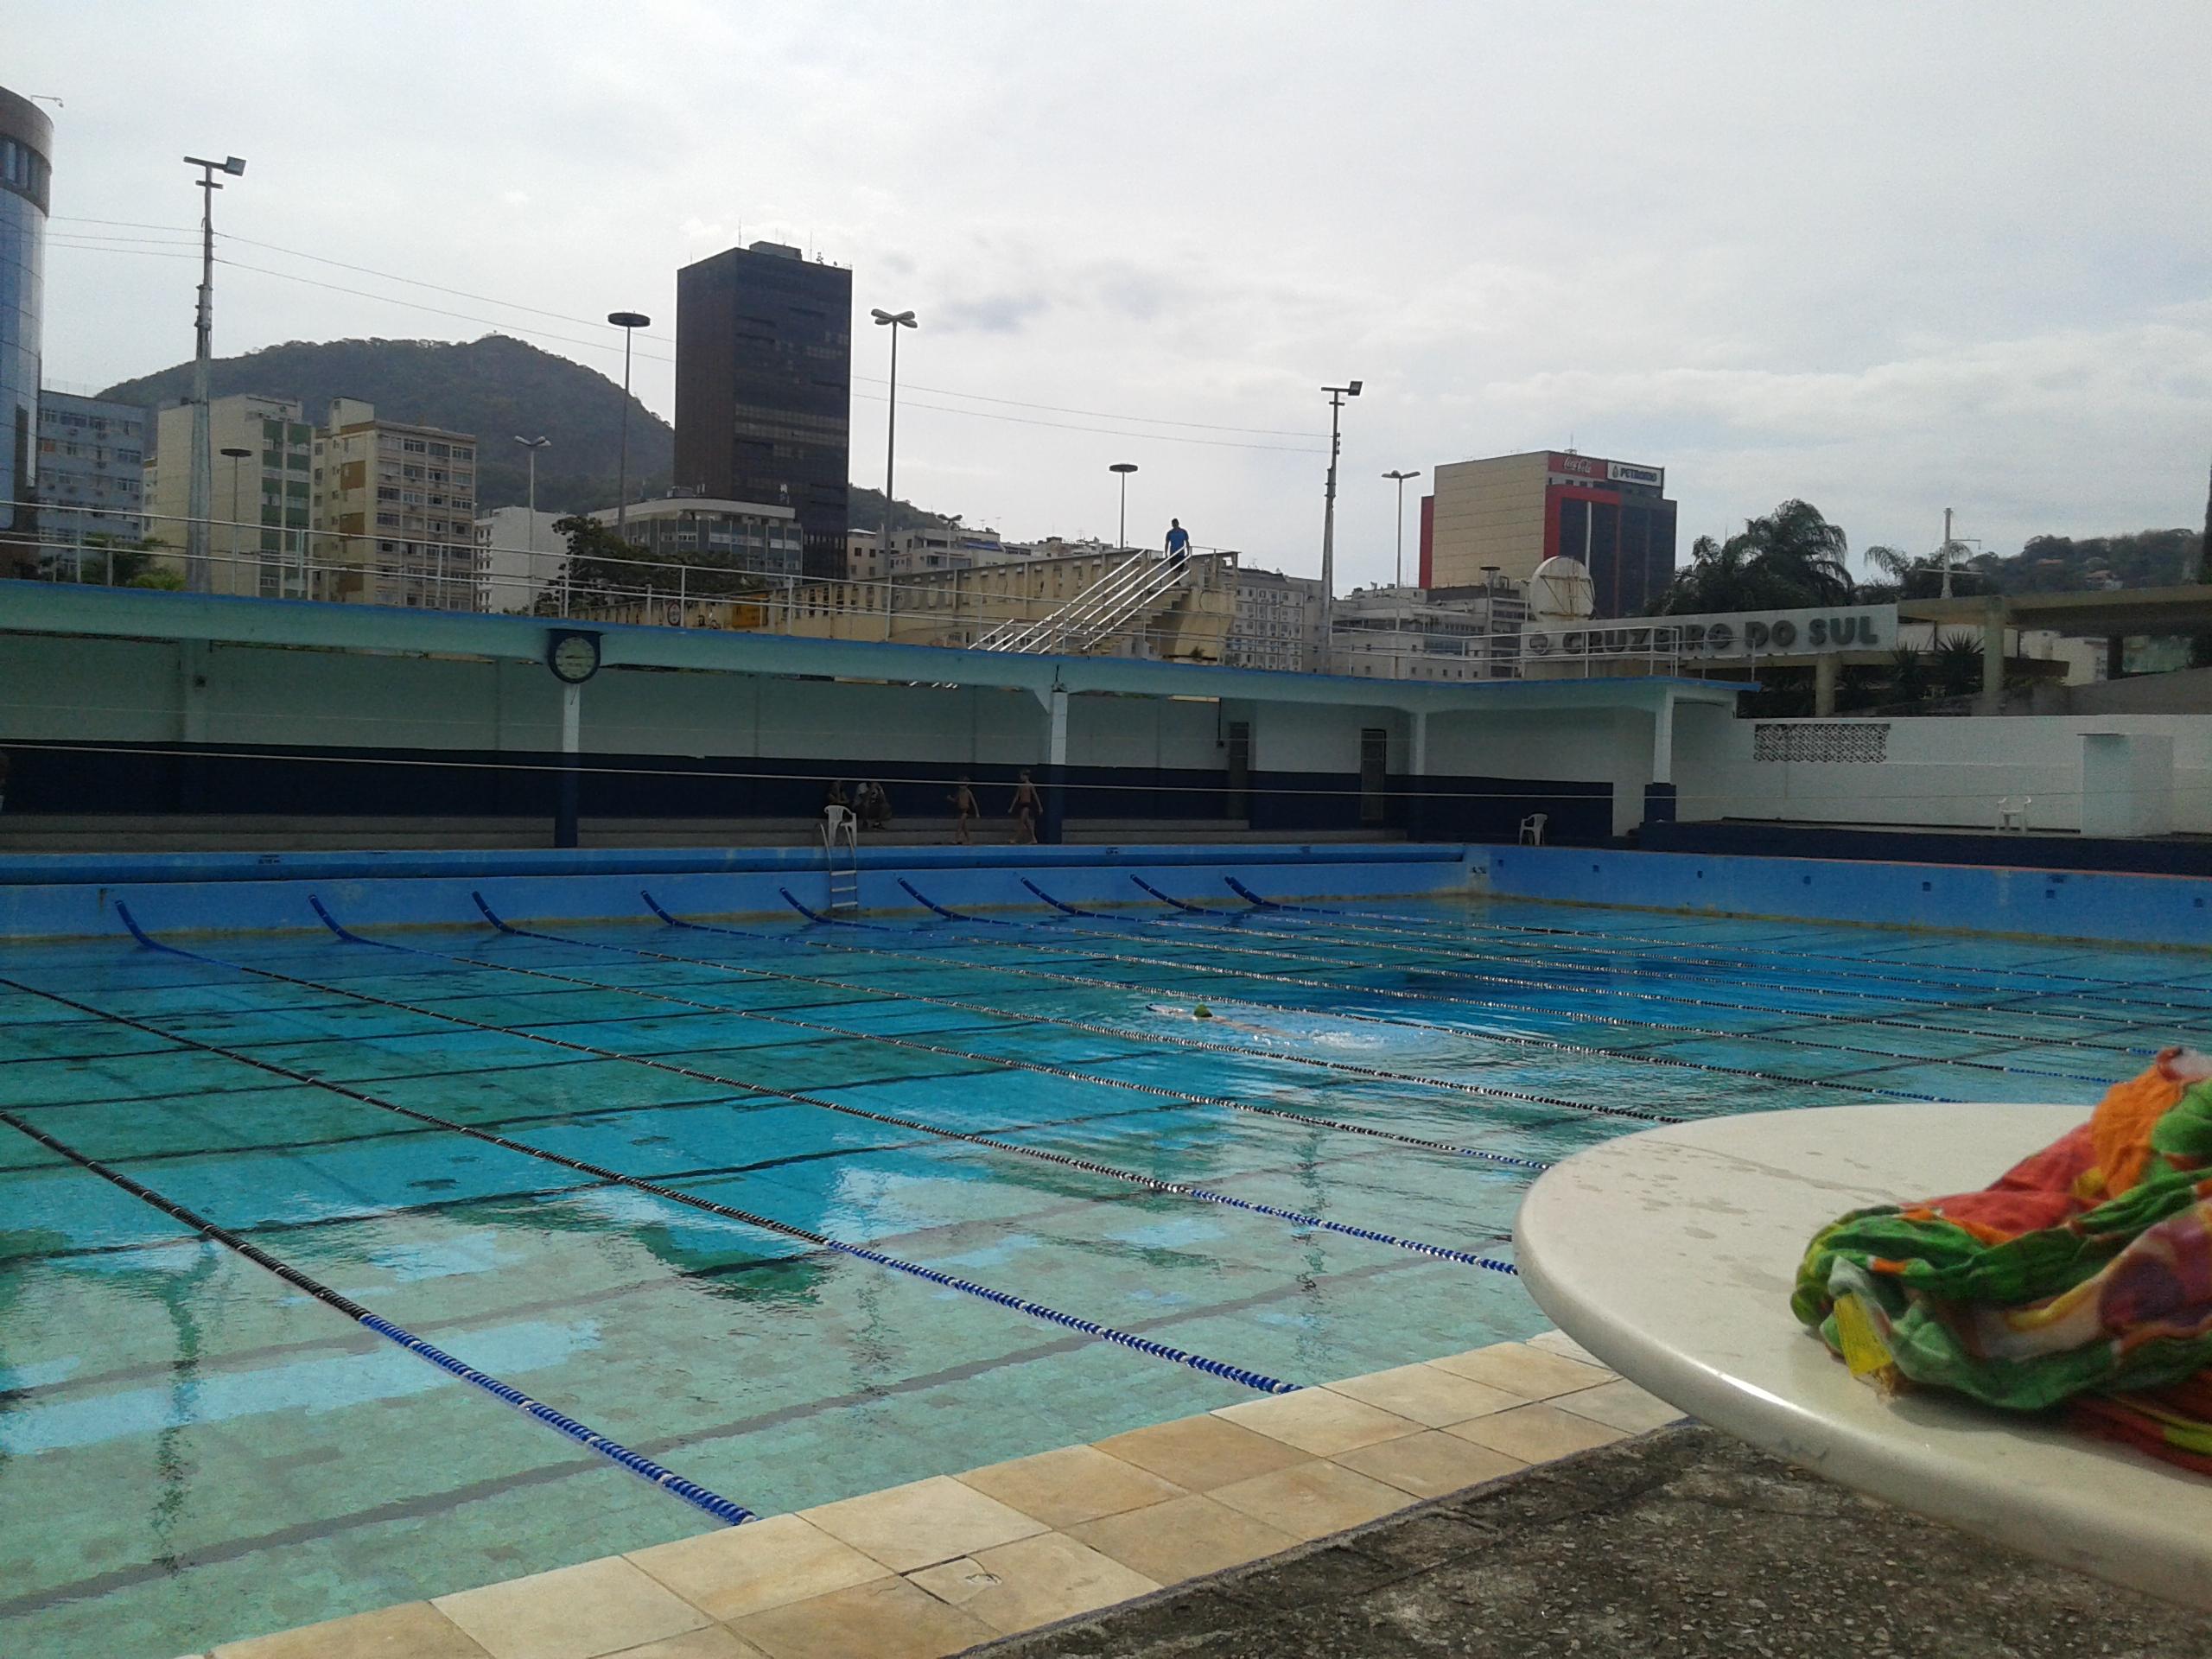 8e3a11273aba7 File 20171007143120 - Piscina Olimpica Centenária - Clube de Regatas  Guanabara - Botafogo - Rio de Janeiro - Brazil.jpg